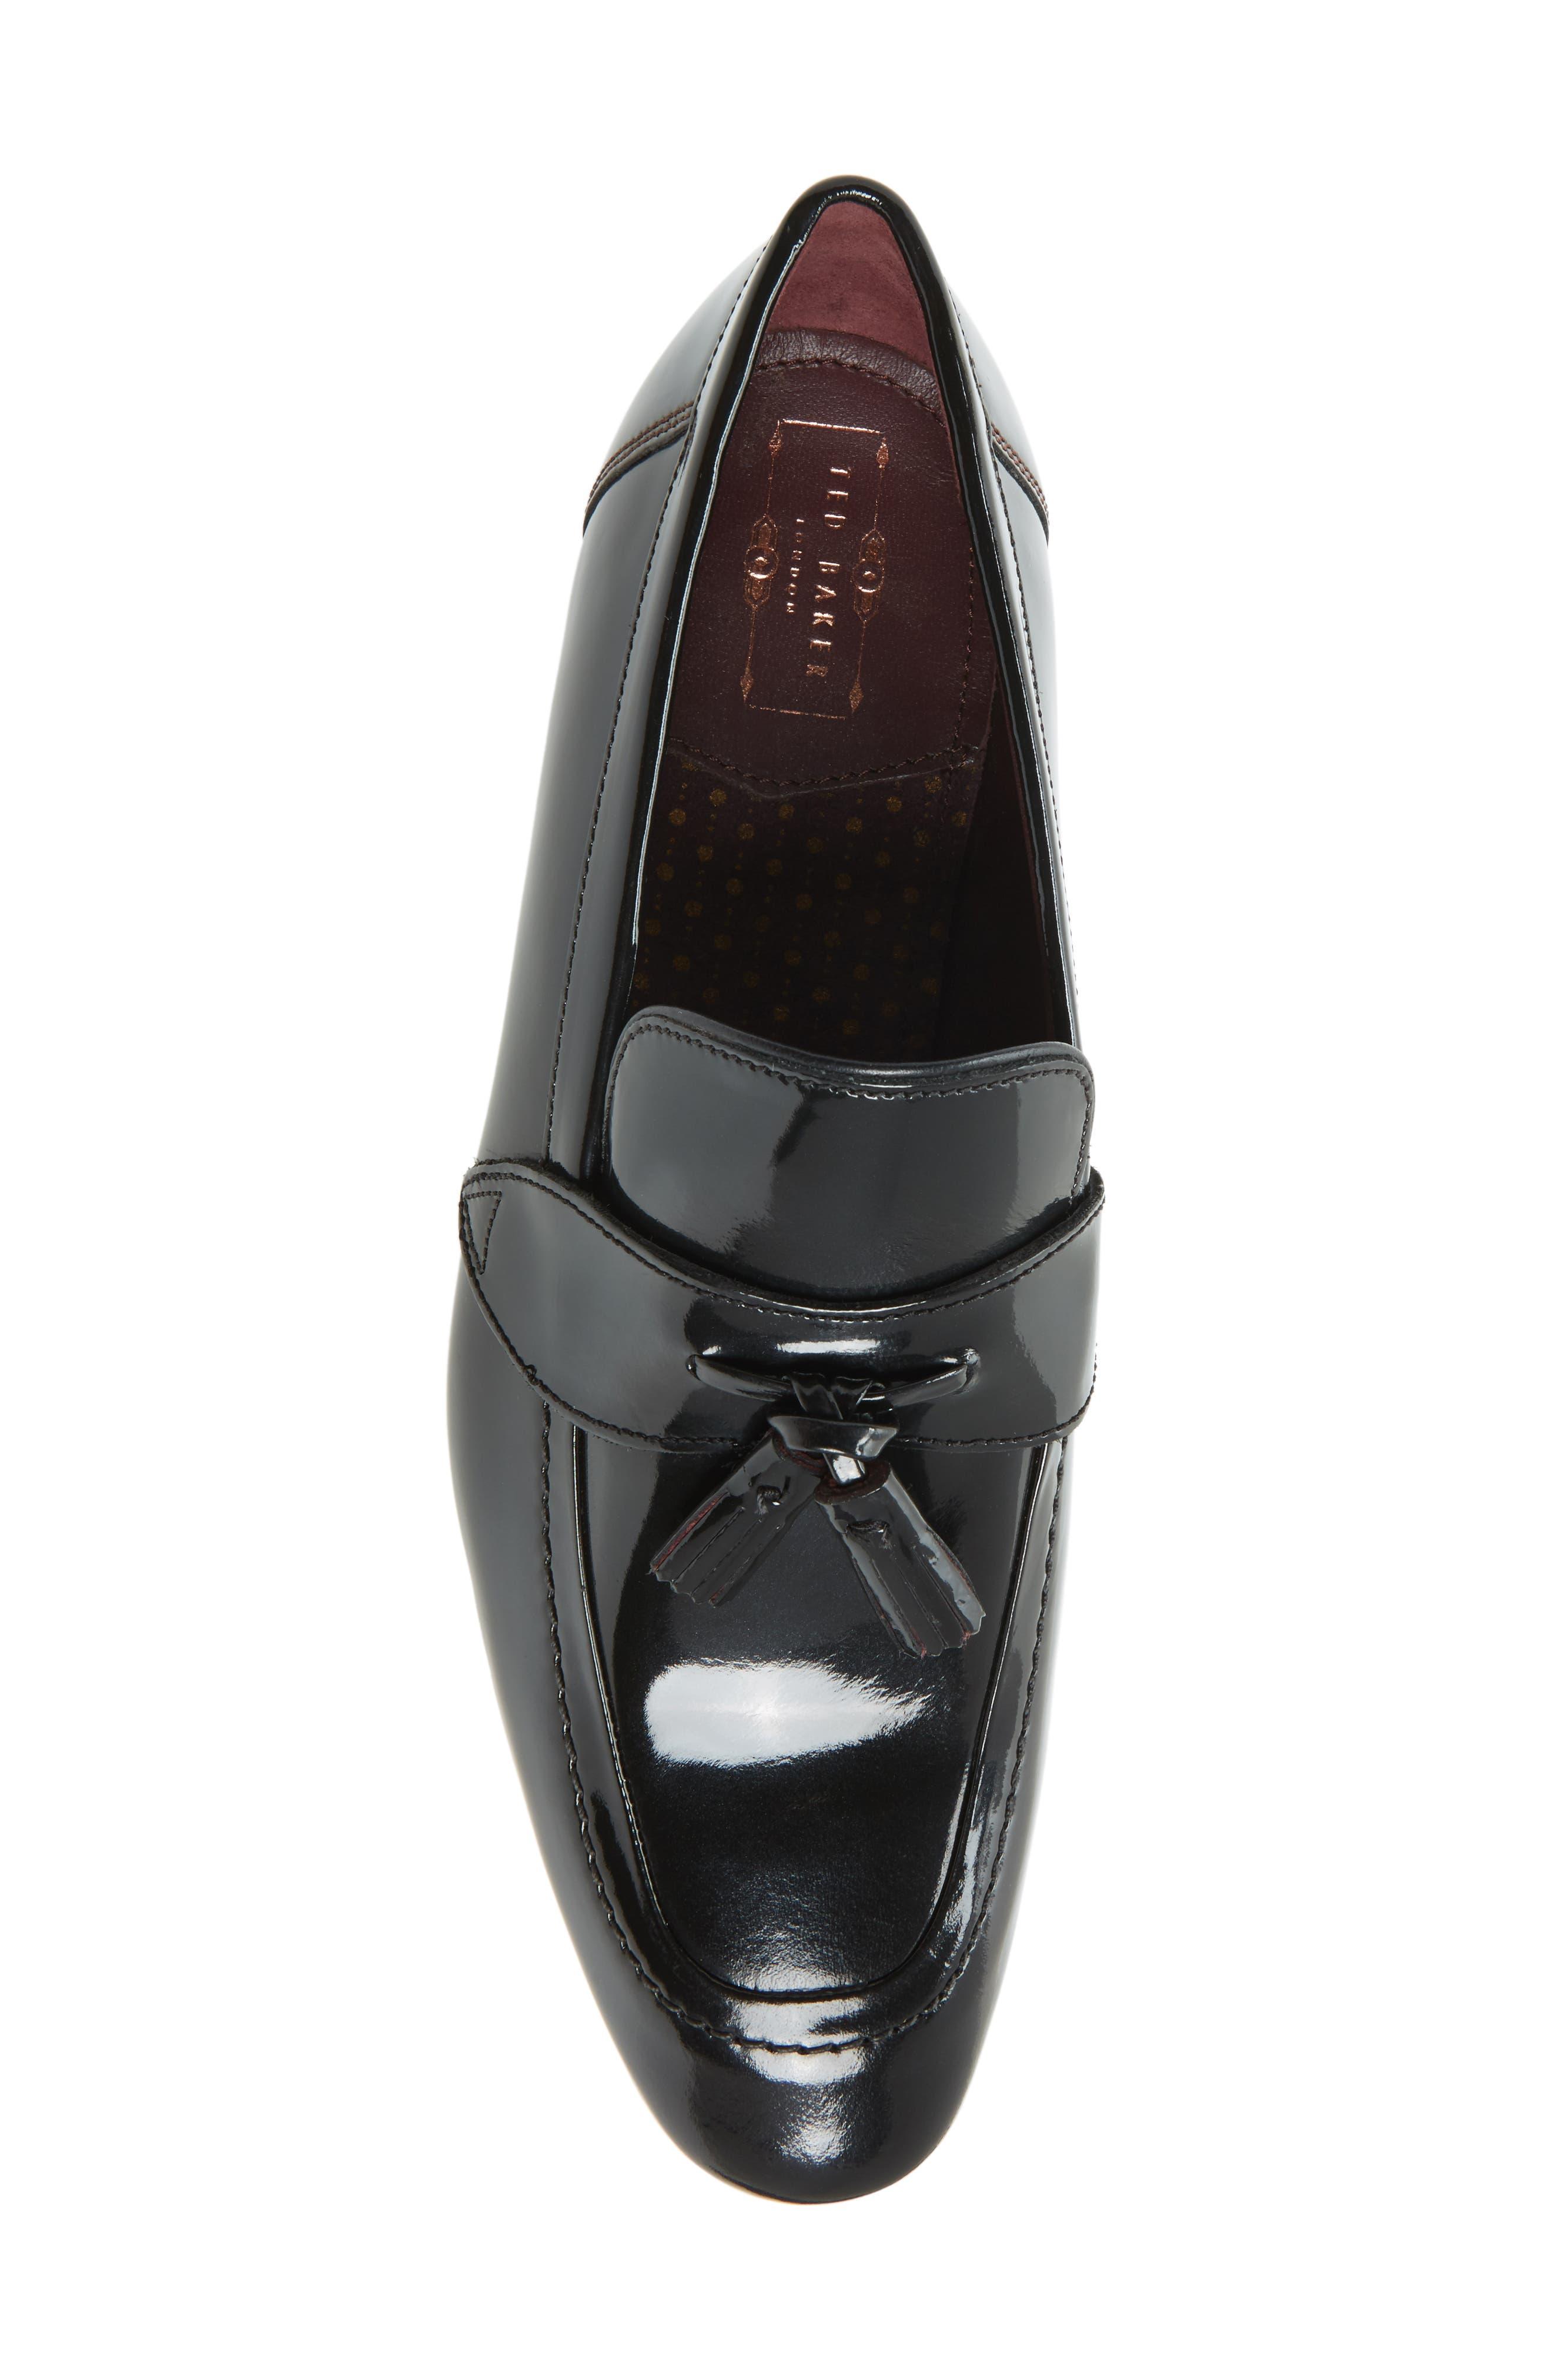 Grafit Tassel Loafer,                             Alternate thumbnail 4, color,                             Black Patent Leather